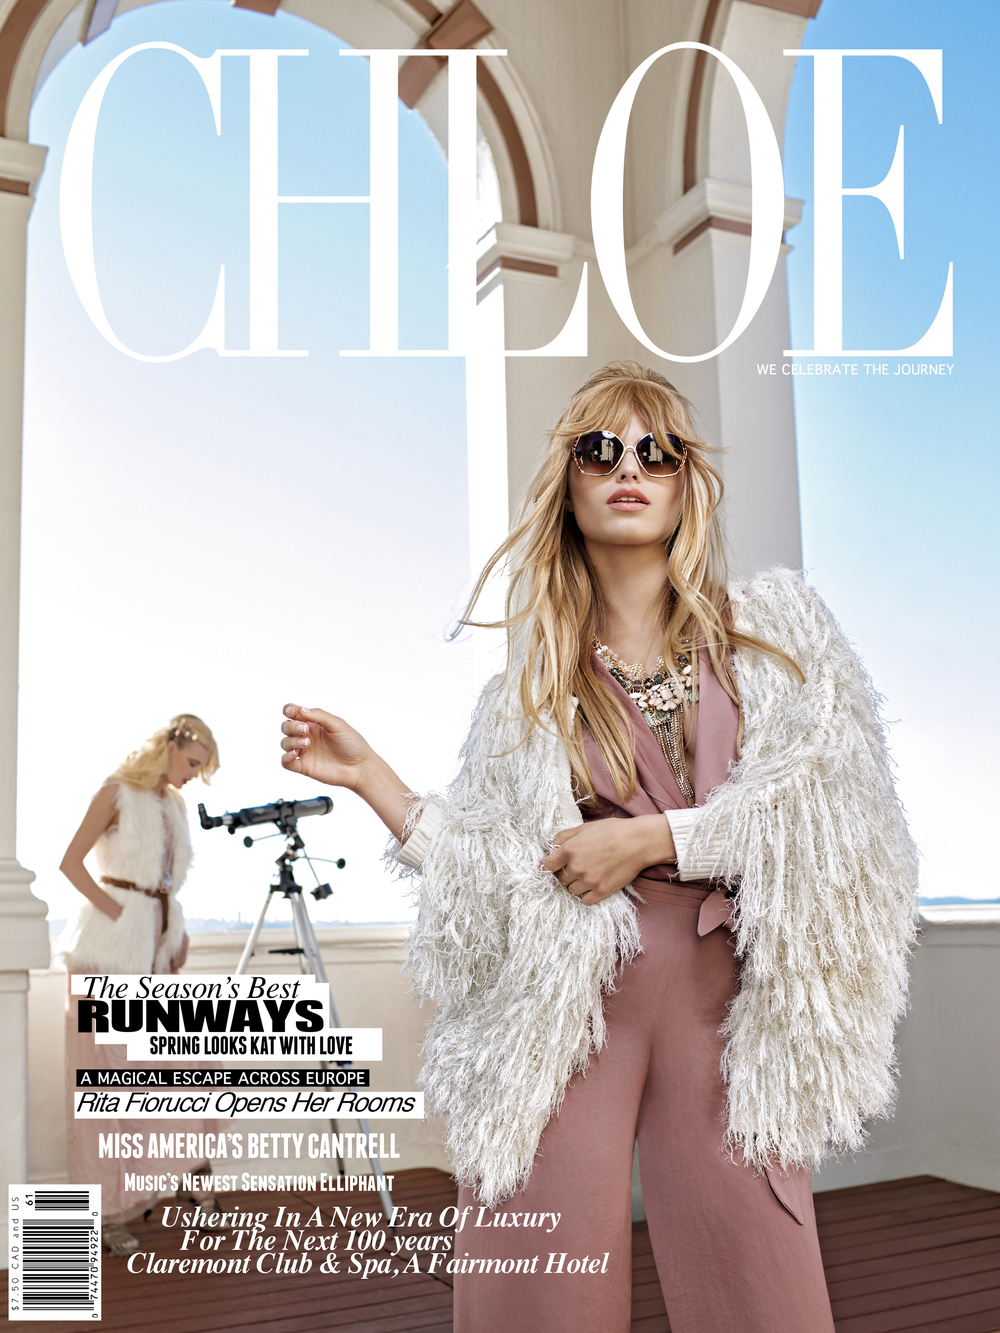 CHLOE Spring 16 Cover HR.jpg